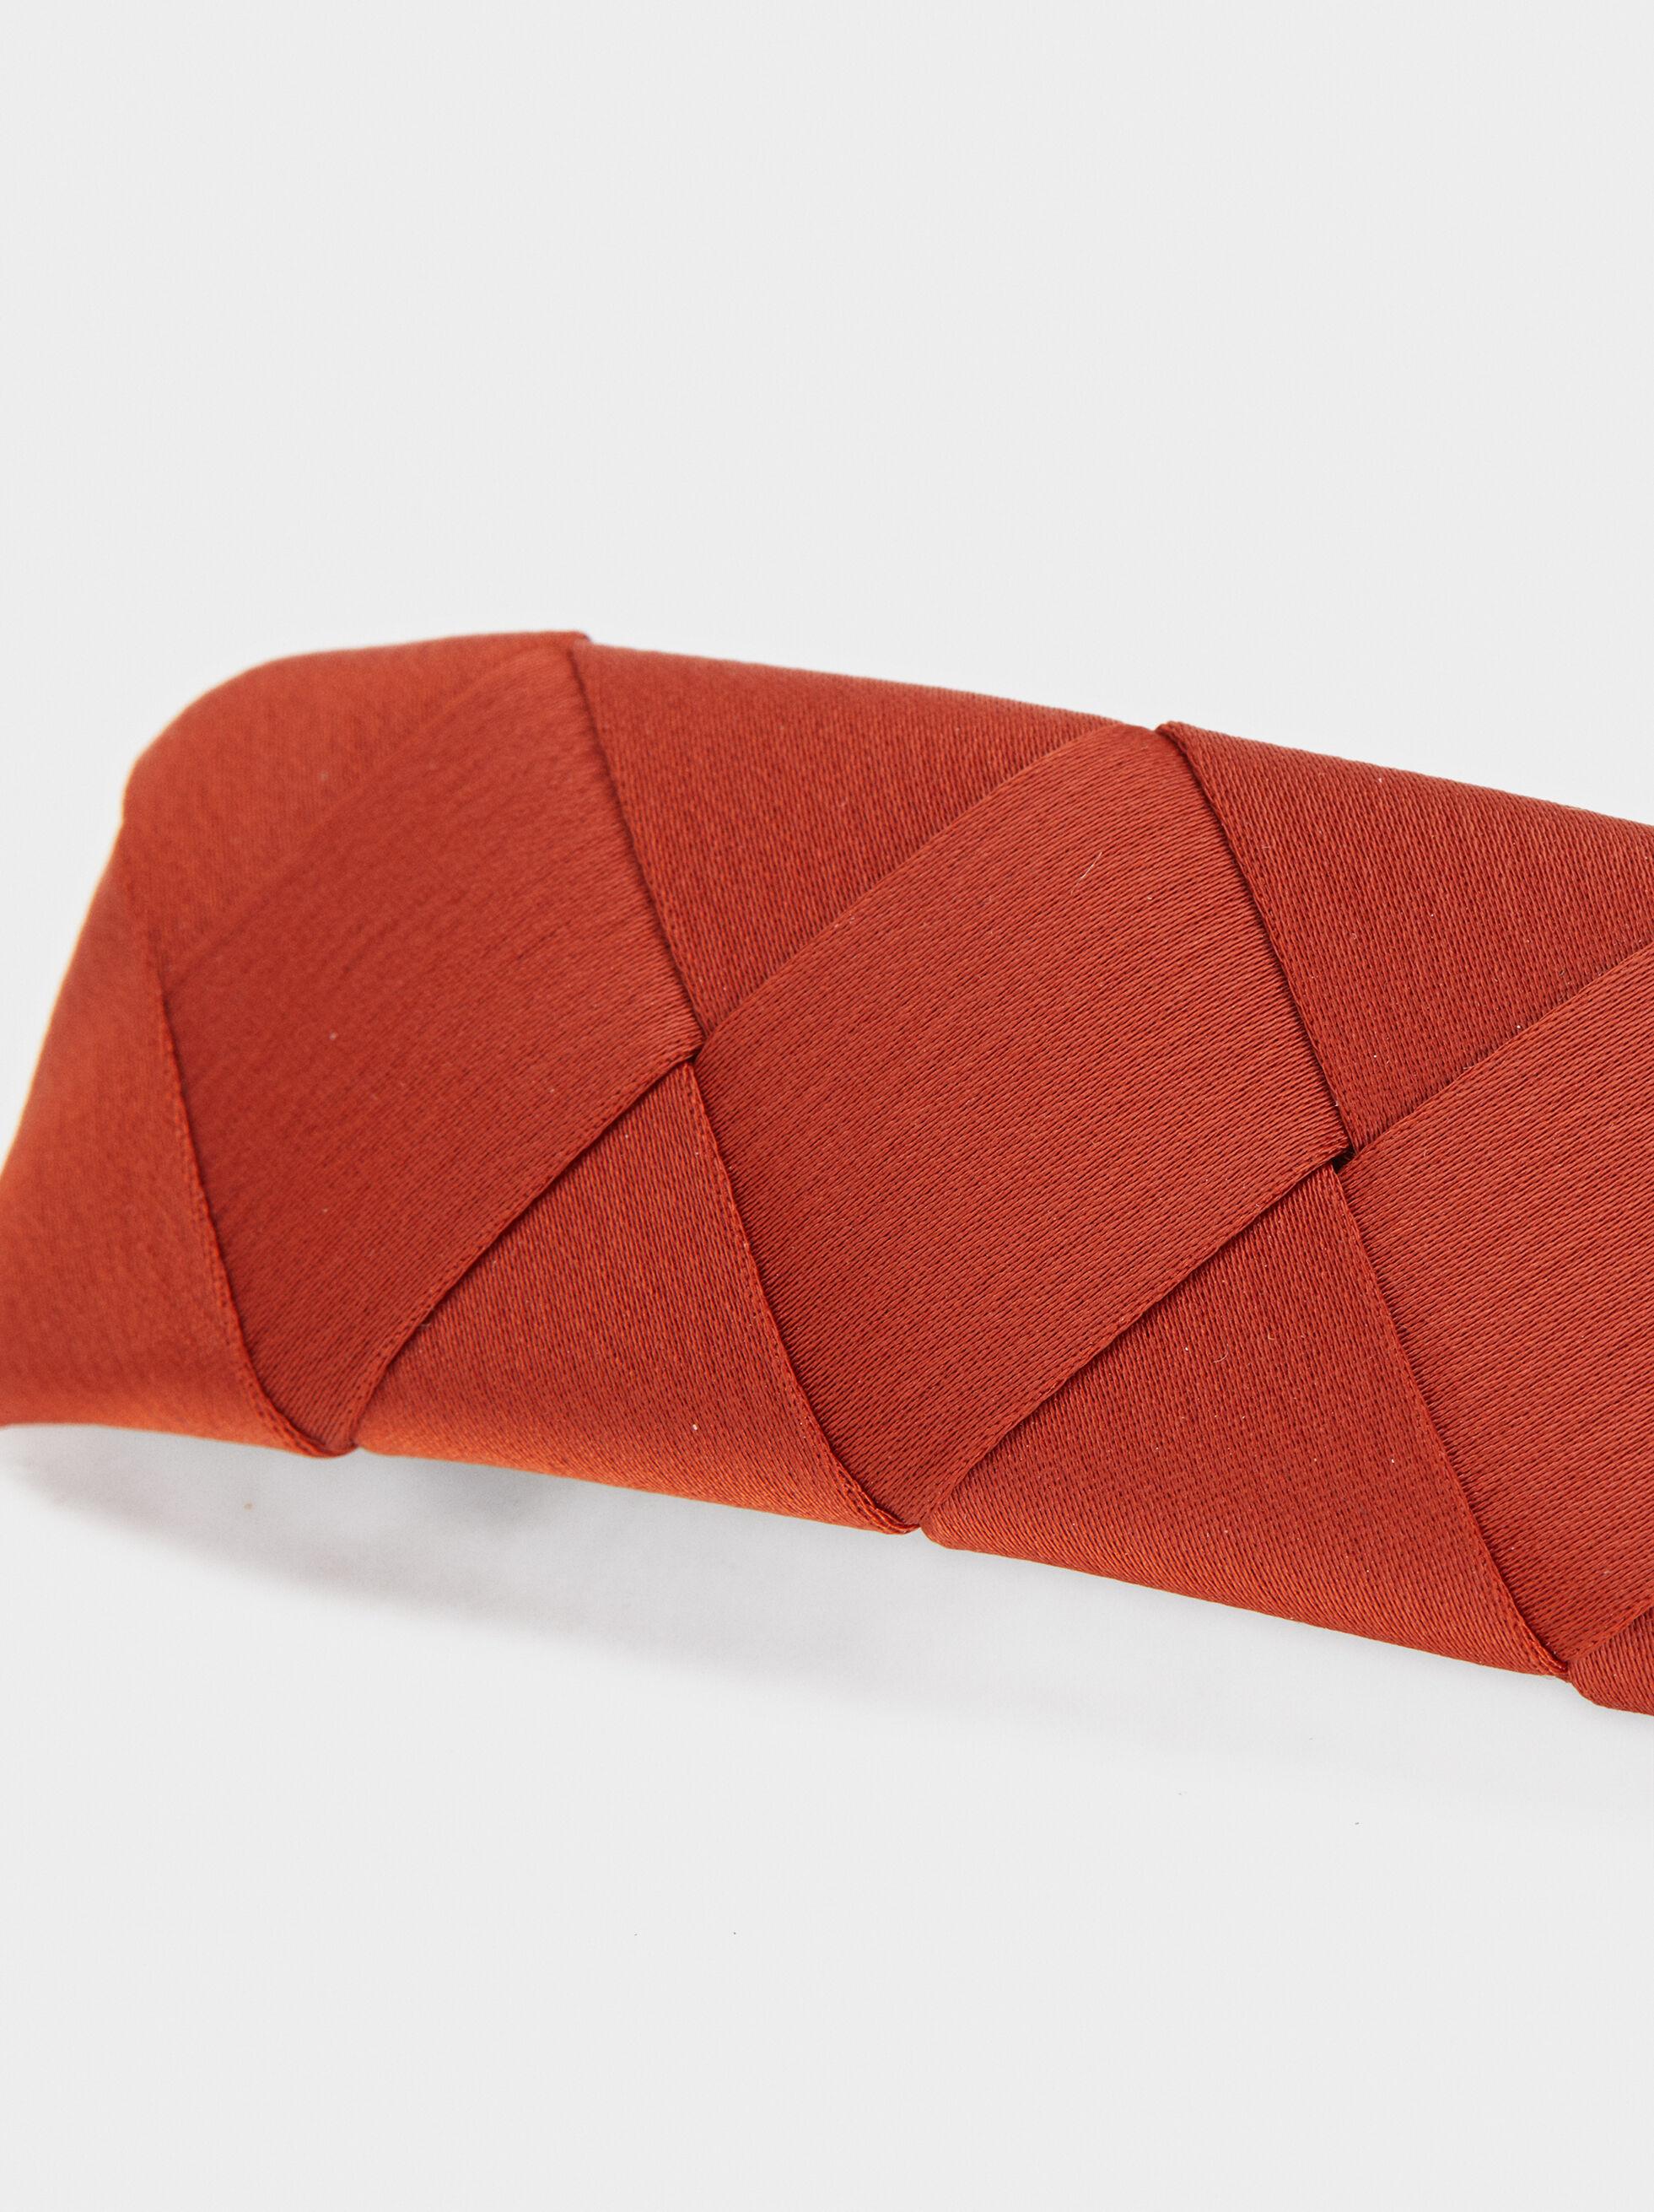 Braided Furry Fabric Hairclip, Brick Red, hi-res